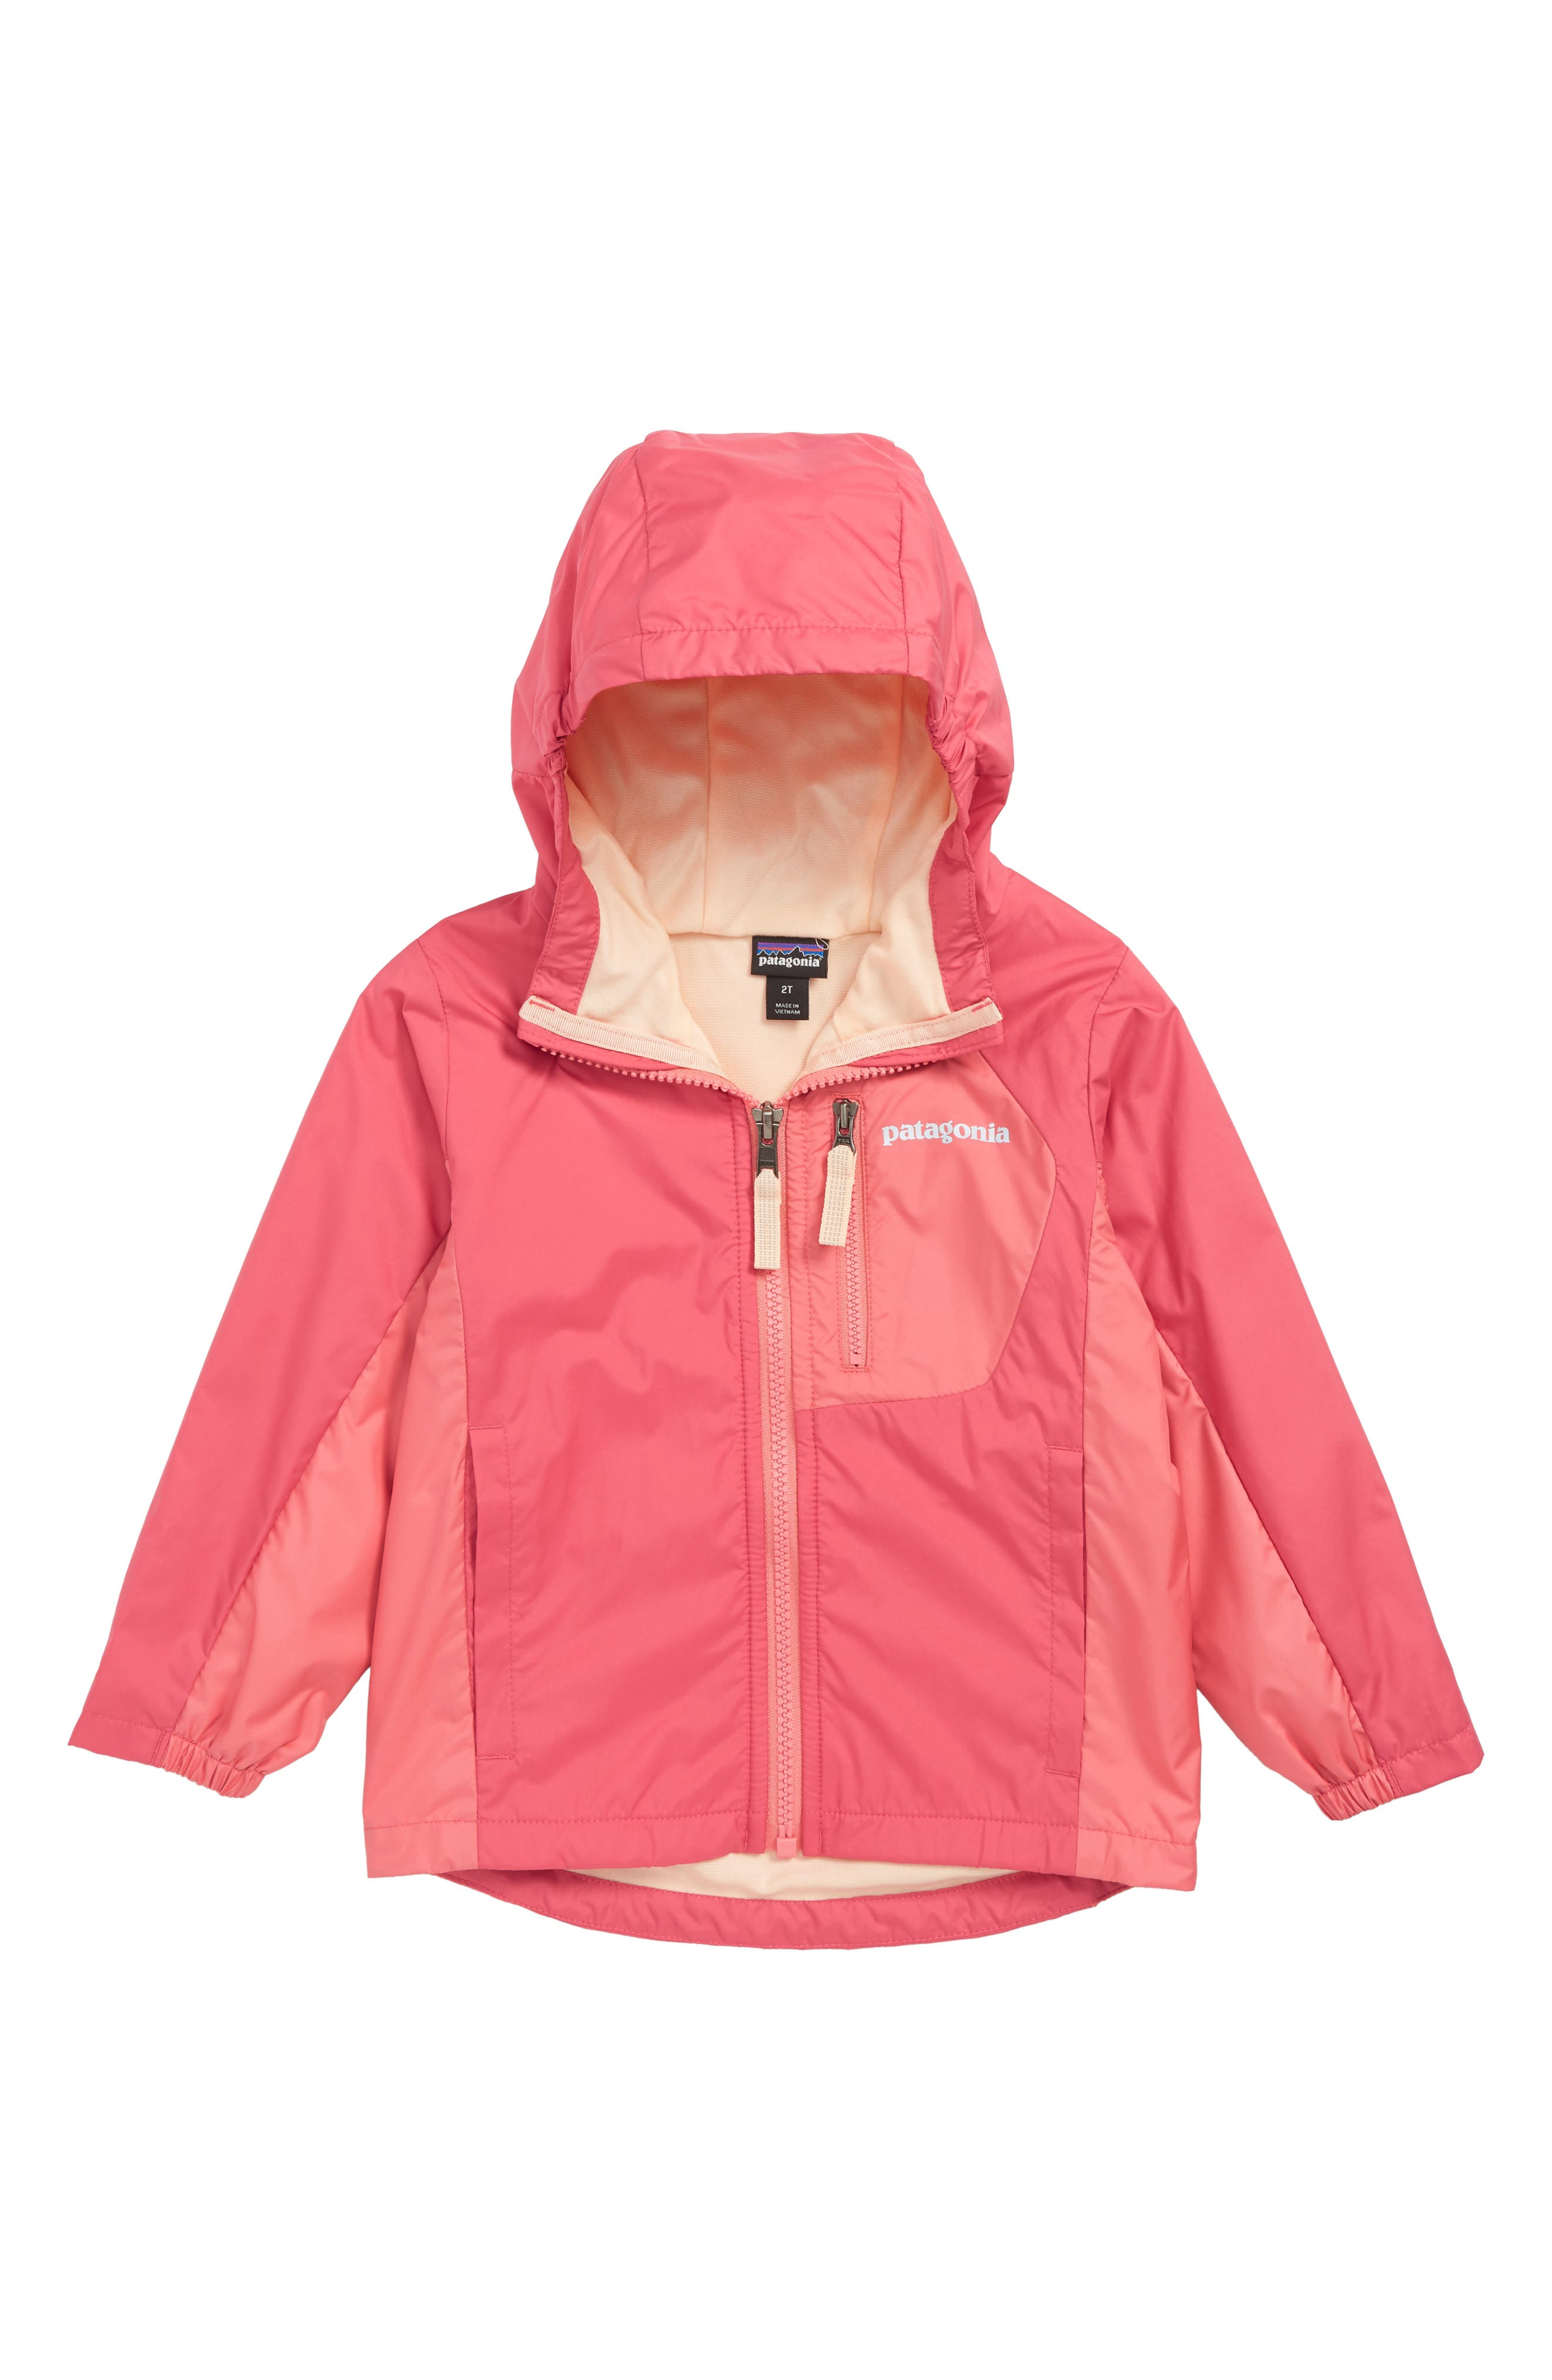 PATAGONIA Quartzsite Hooded Jacket, Main, color, REPI REEF PINK